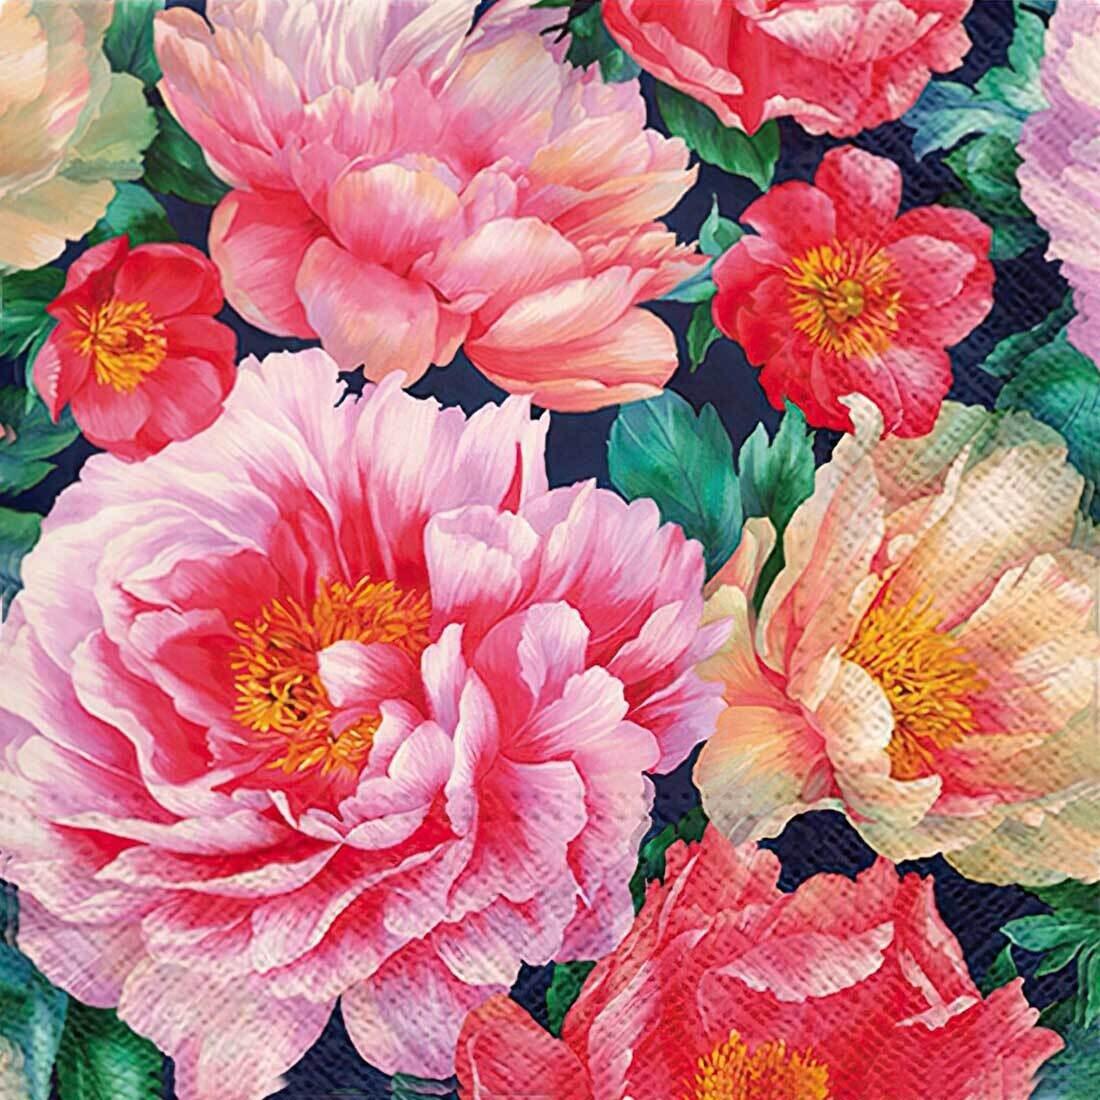 Decoupage Paper Napkins - Floral - Peonies Bloom (1 Sheet)